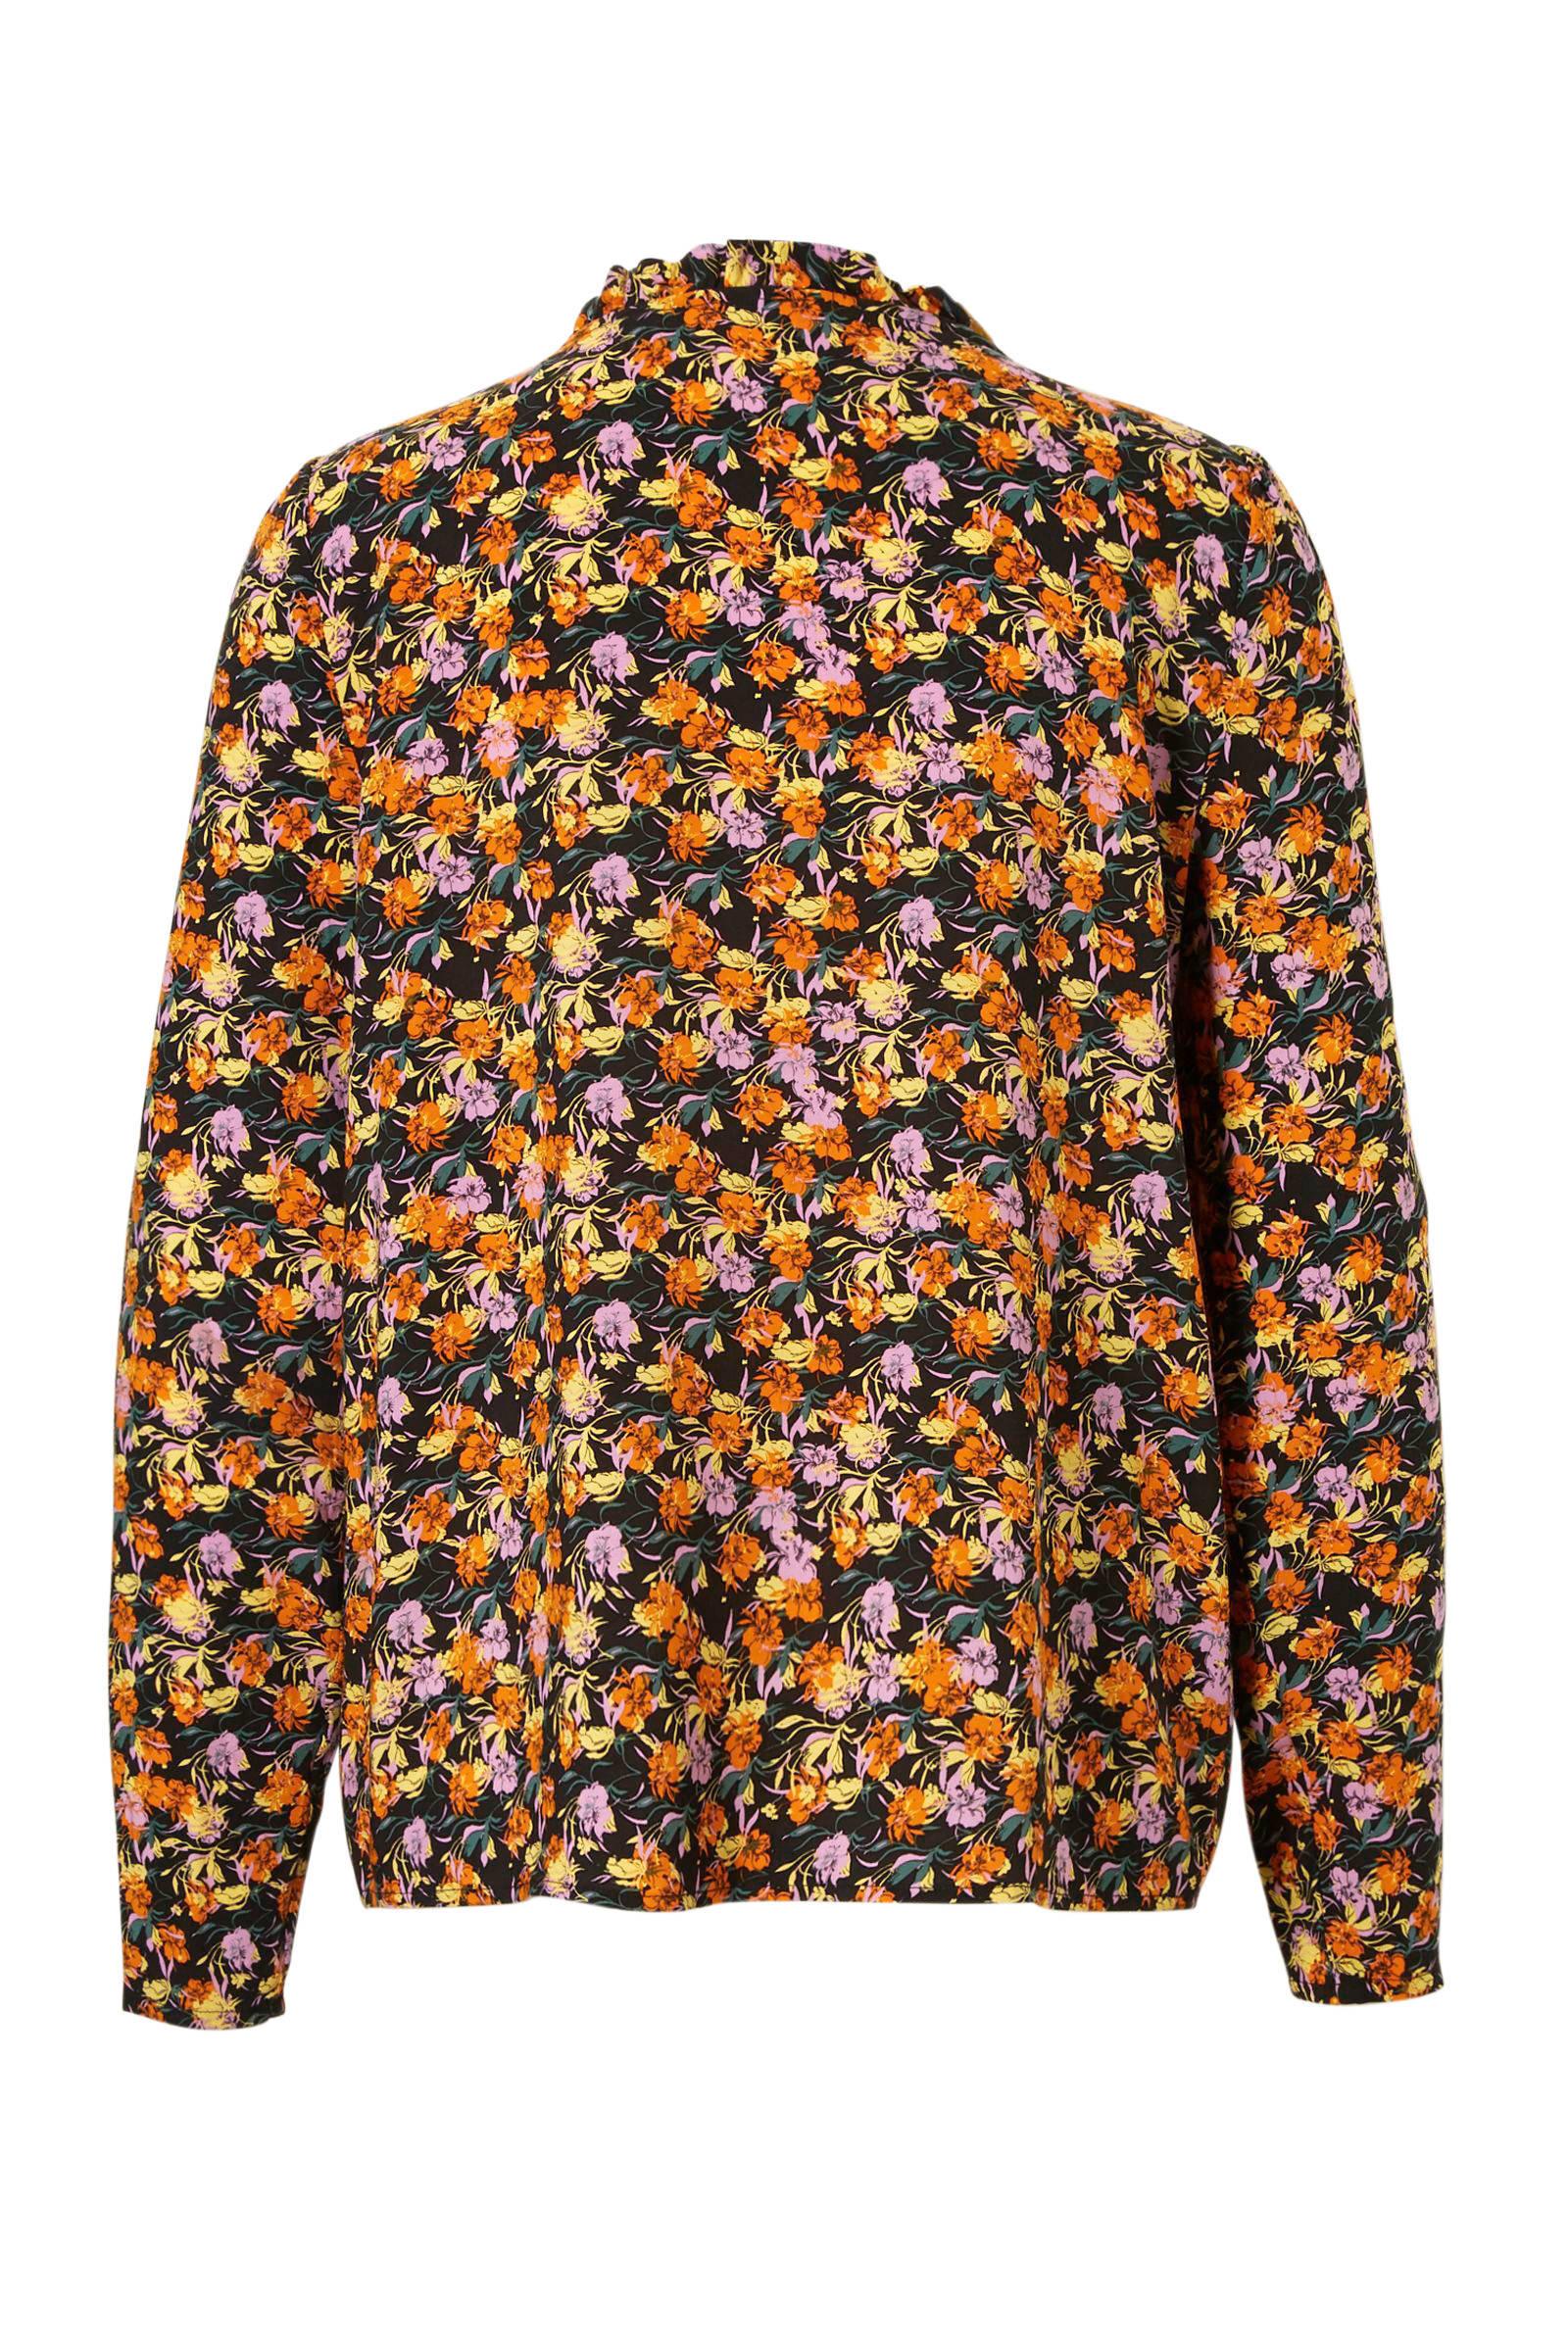 gebloemde blouse blouse gebloemde ICHI ICHI 0qxa7